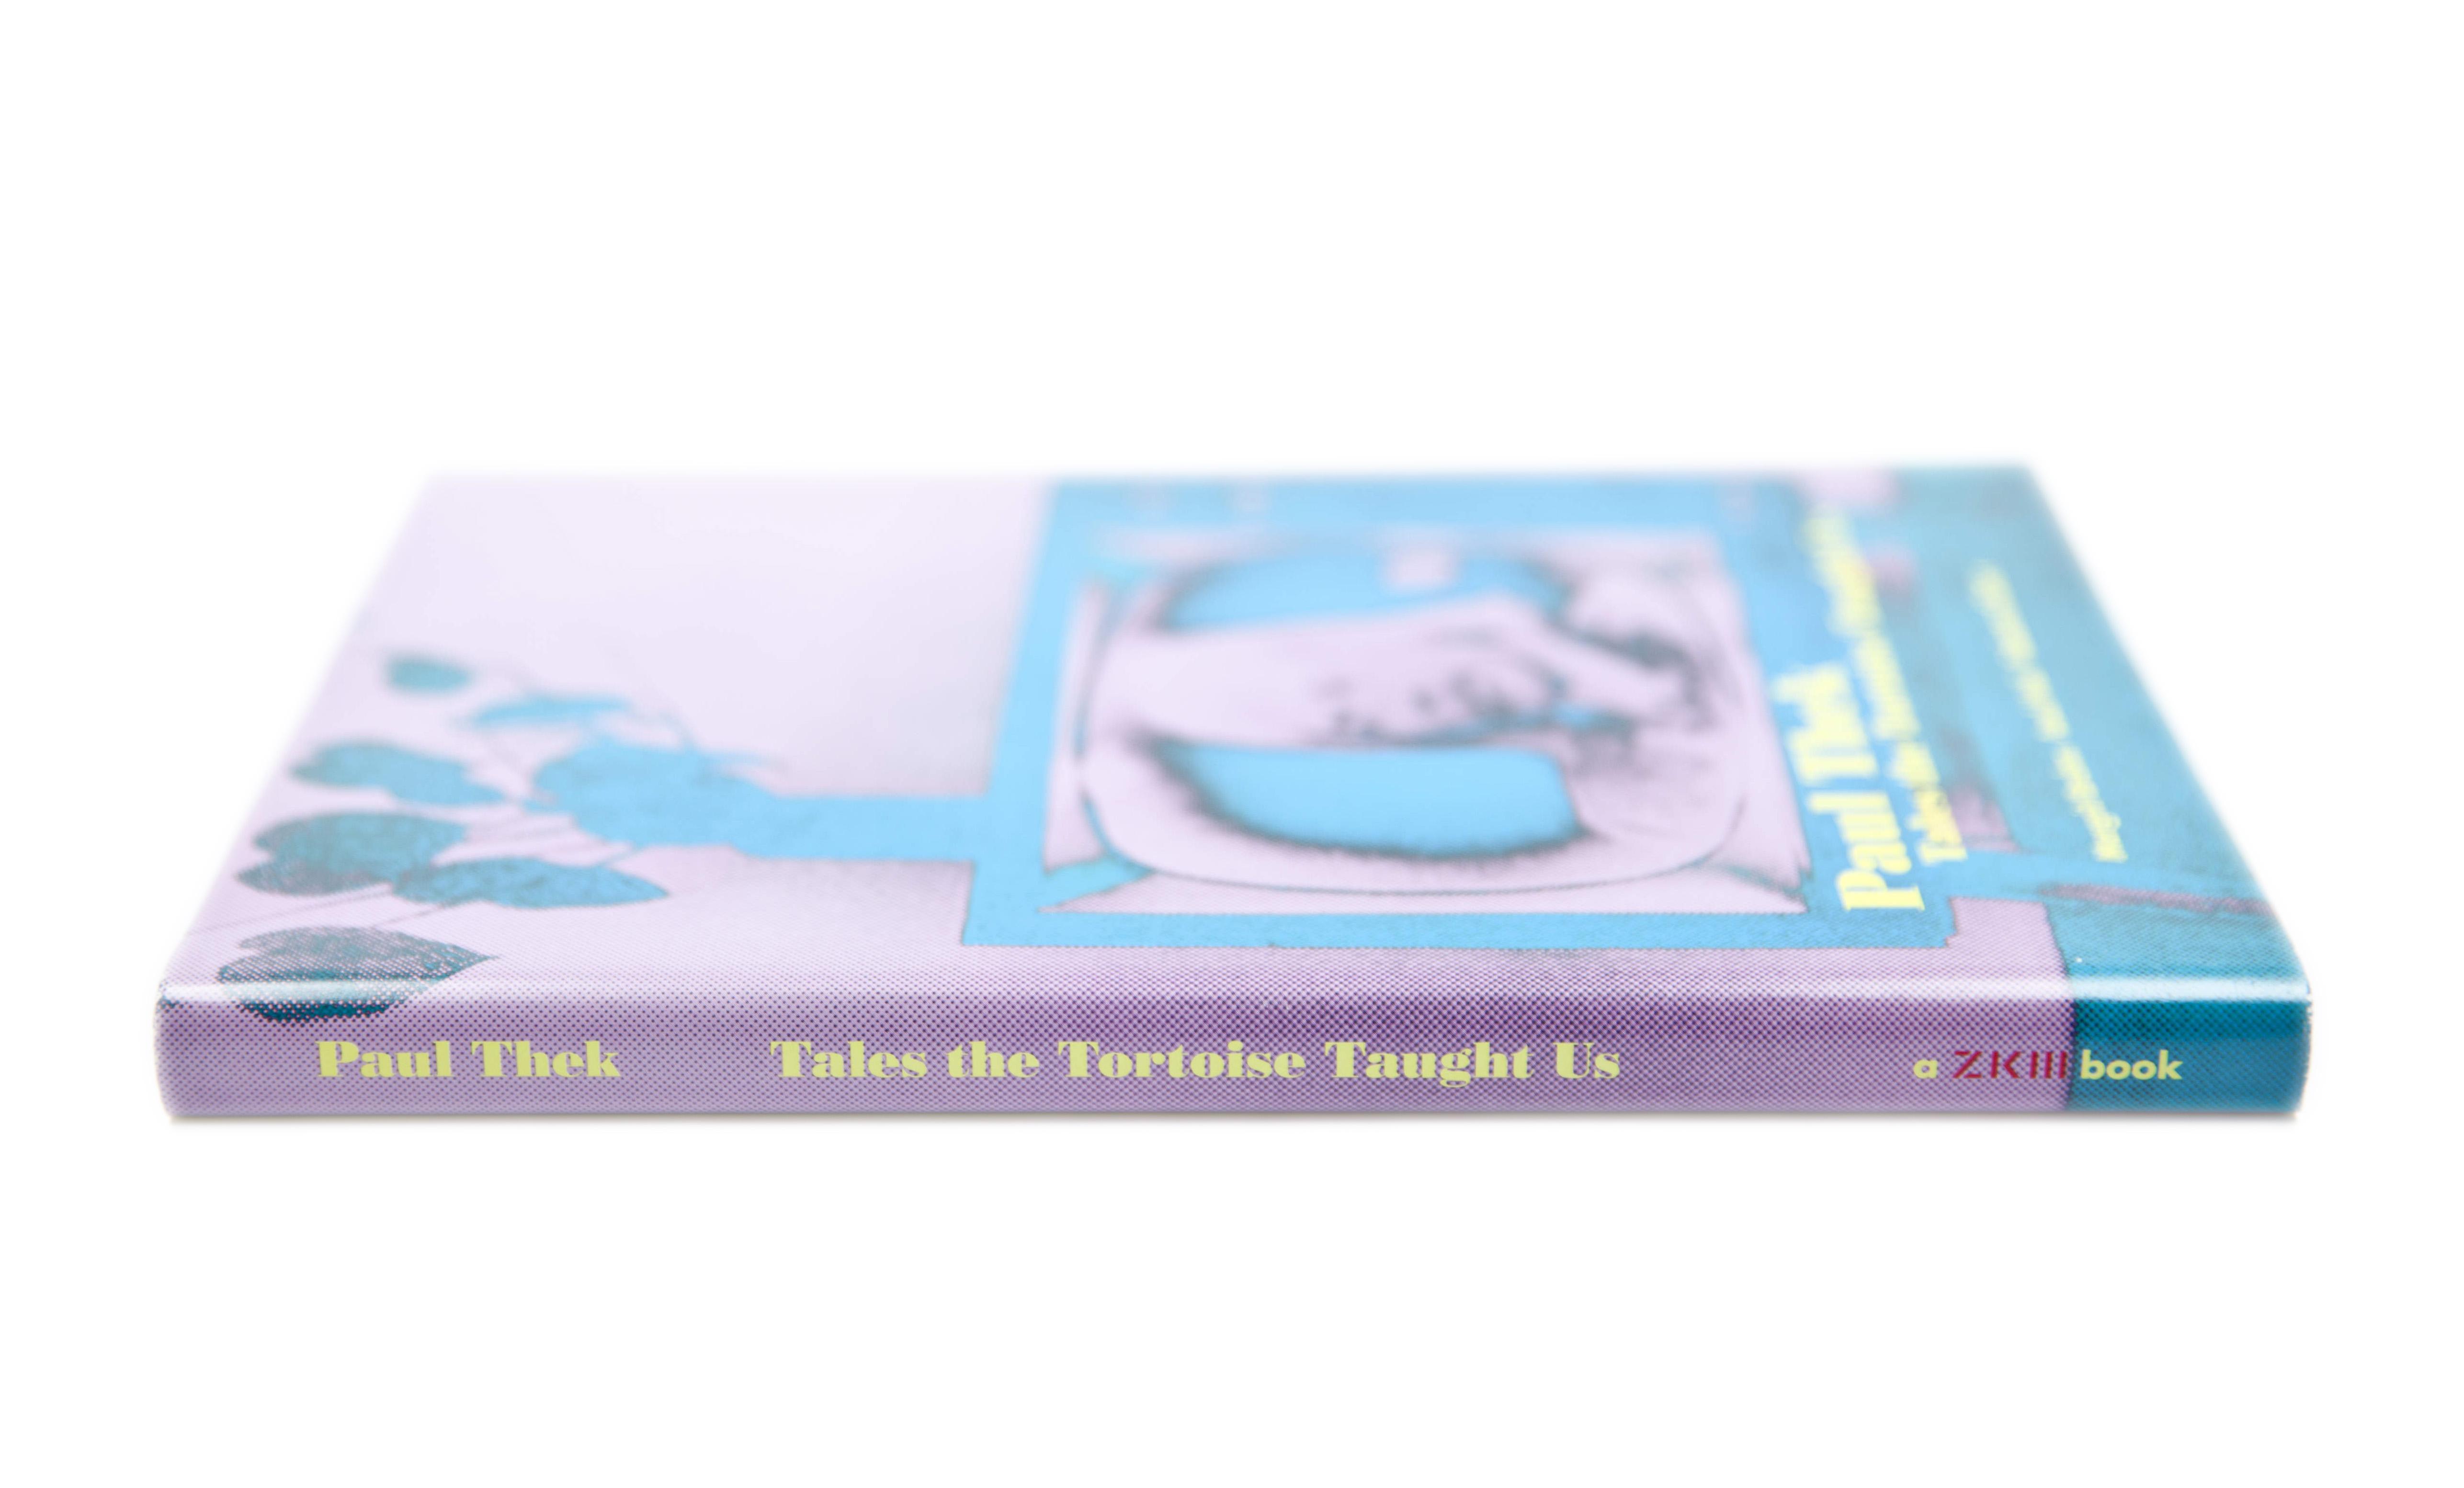 Paul Thek: Tales the Tortoise Taught Us